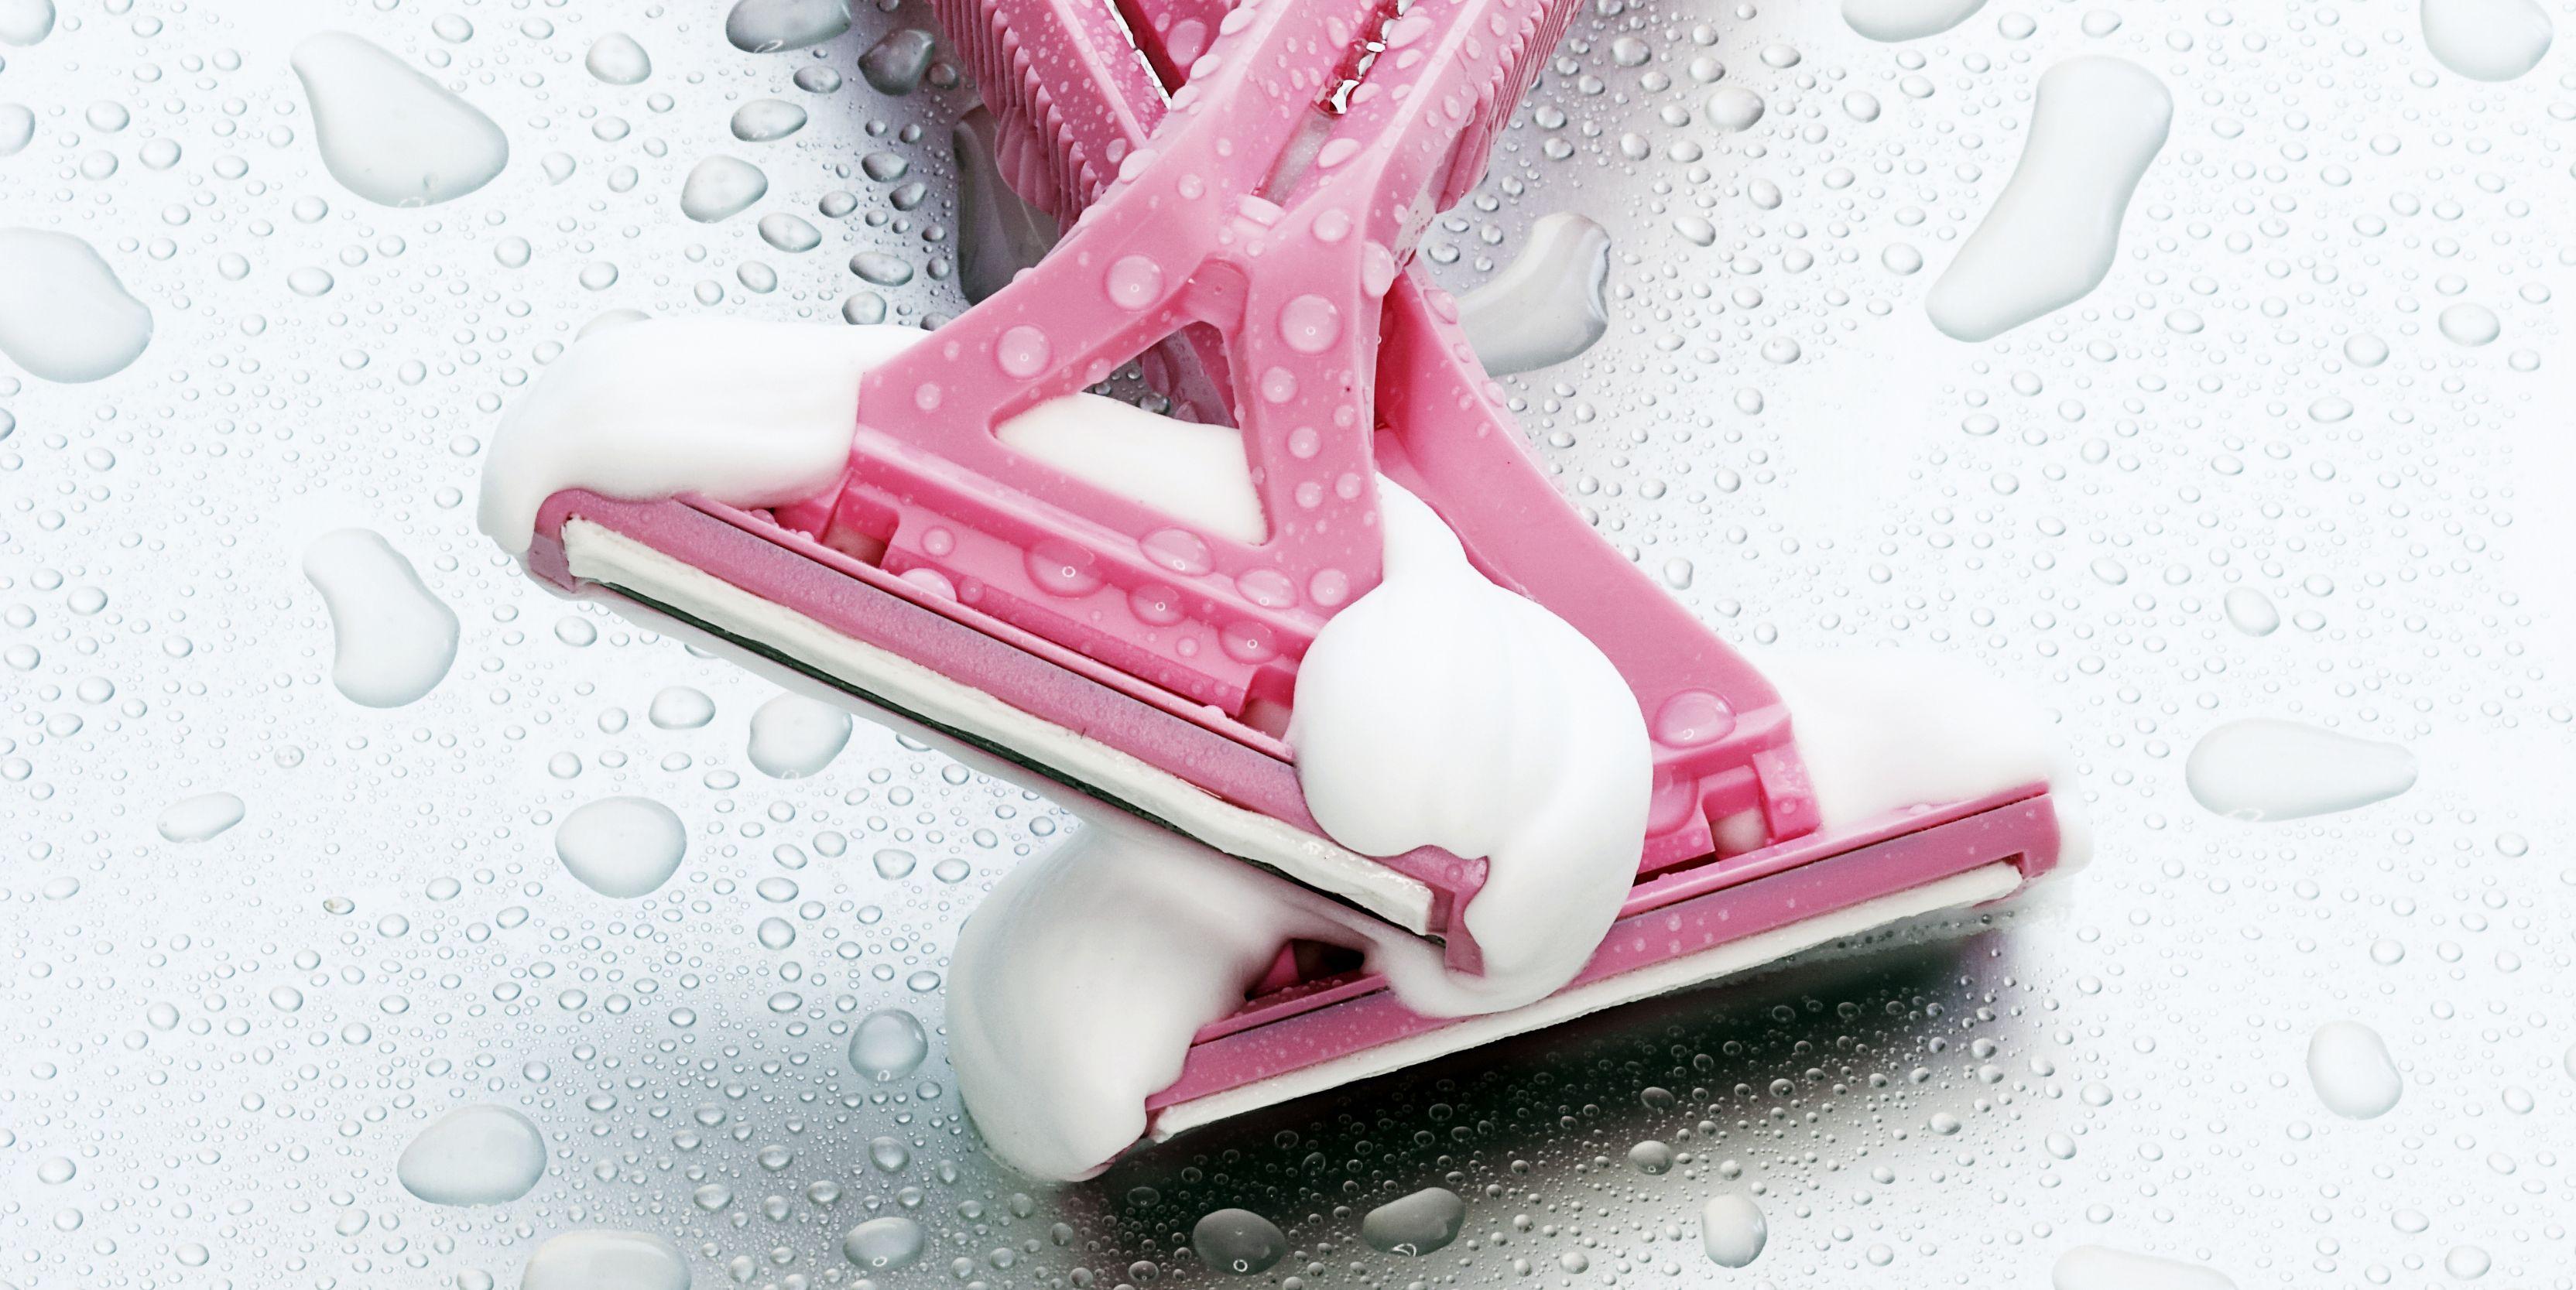 How to stop hellish shaving rash on your bikini line once and for all